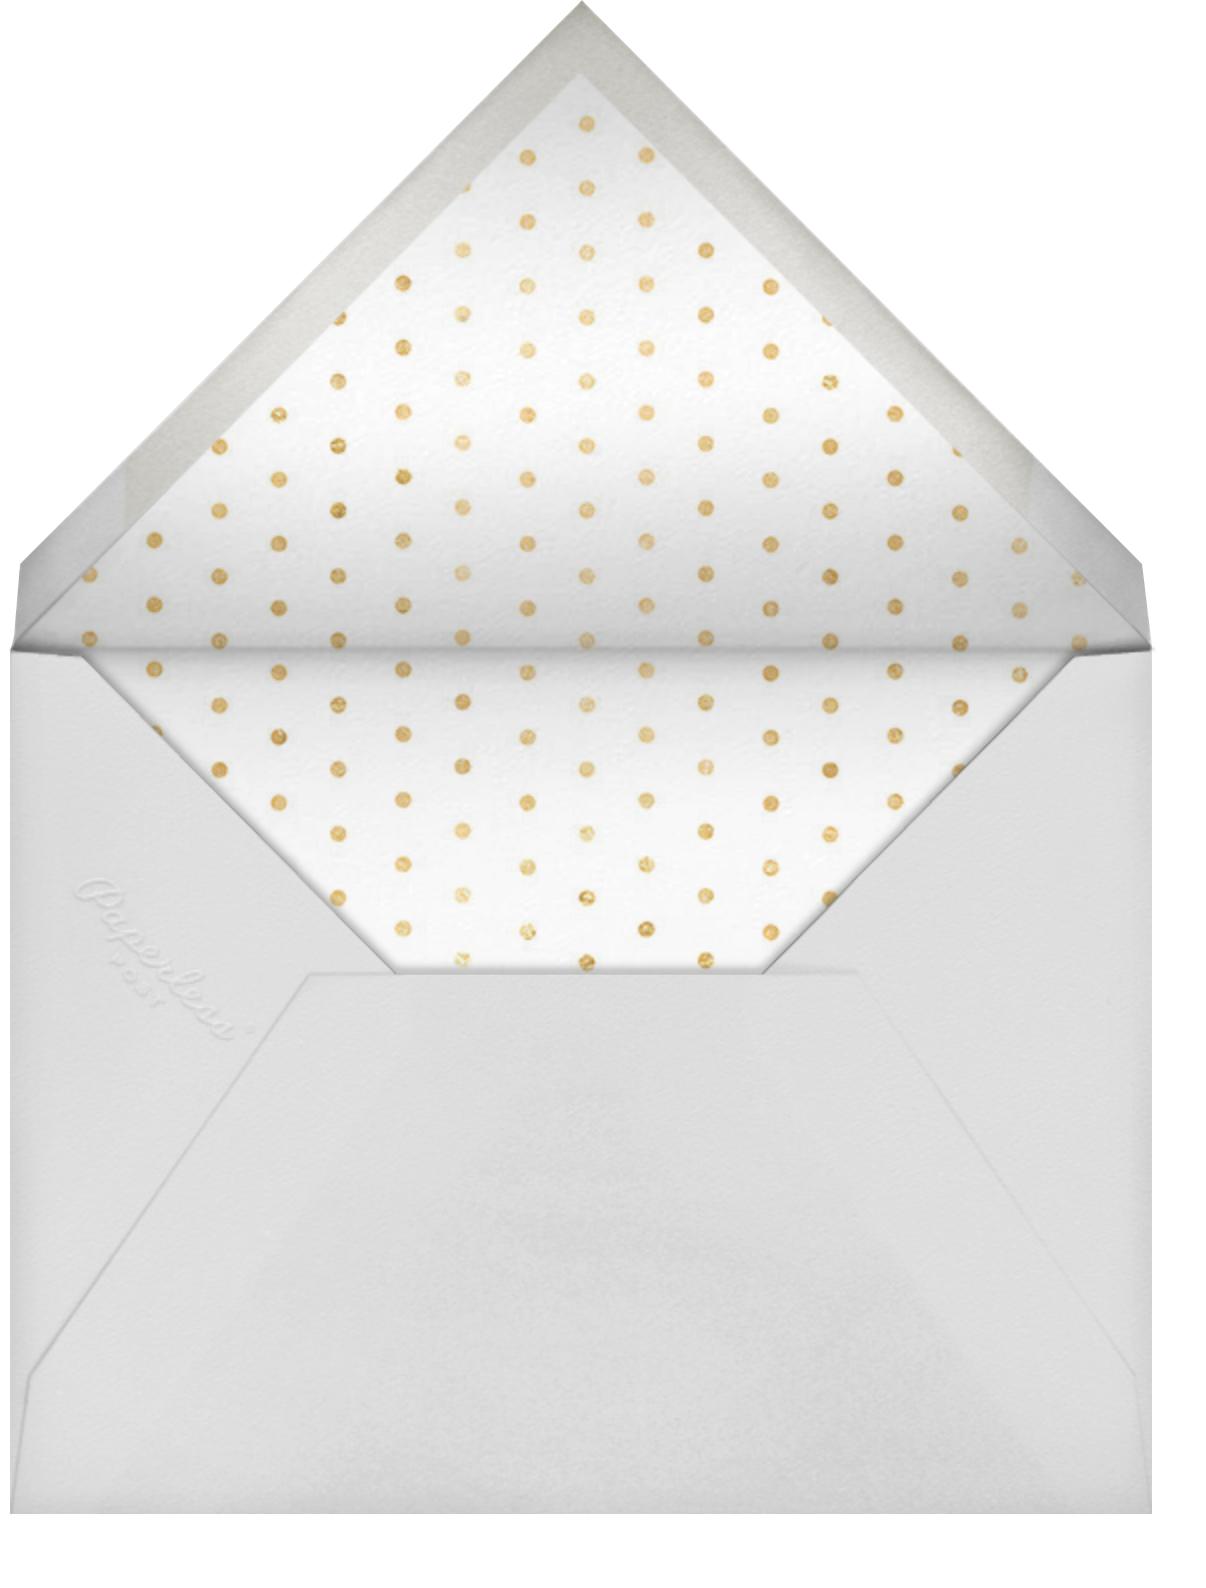 Candle Corner - kate spade new york - Adult birthday - envelope back